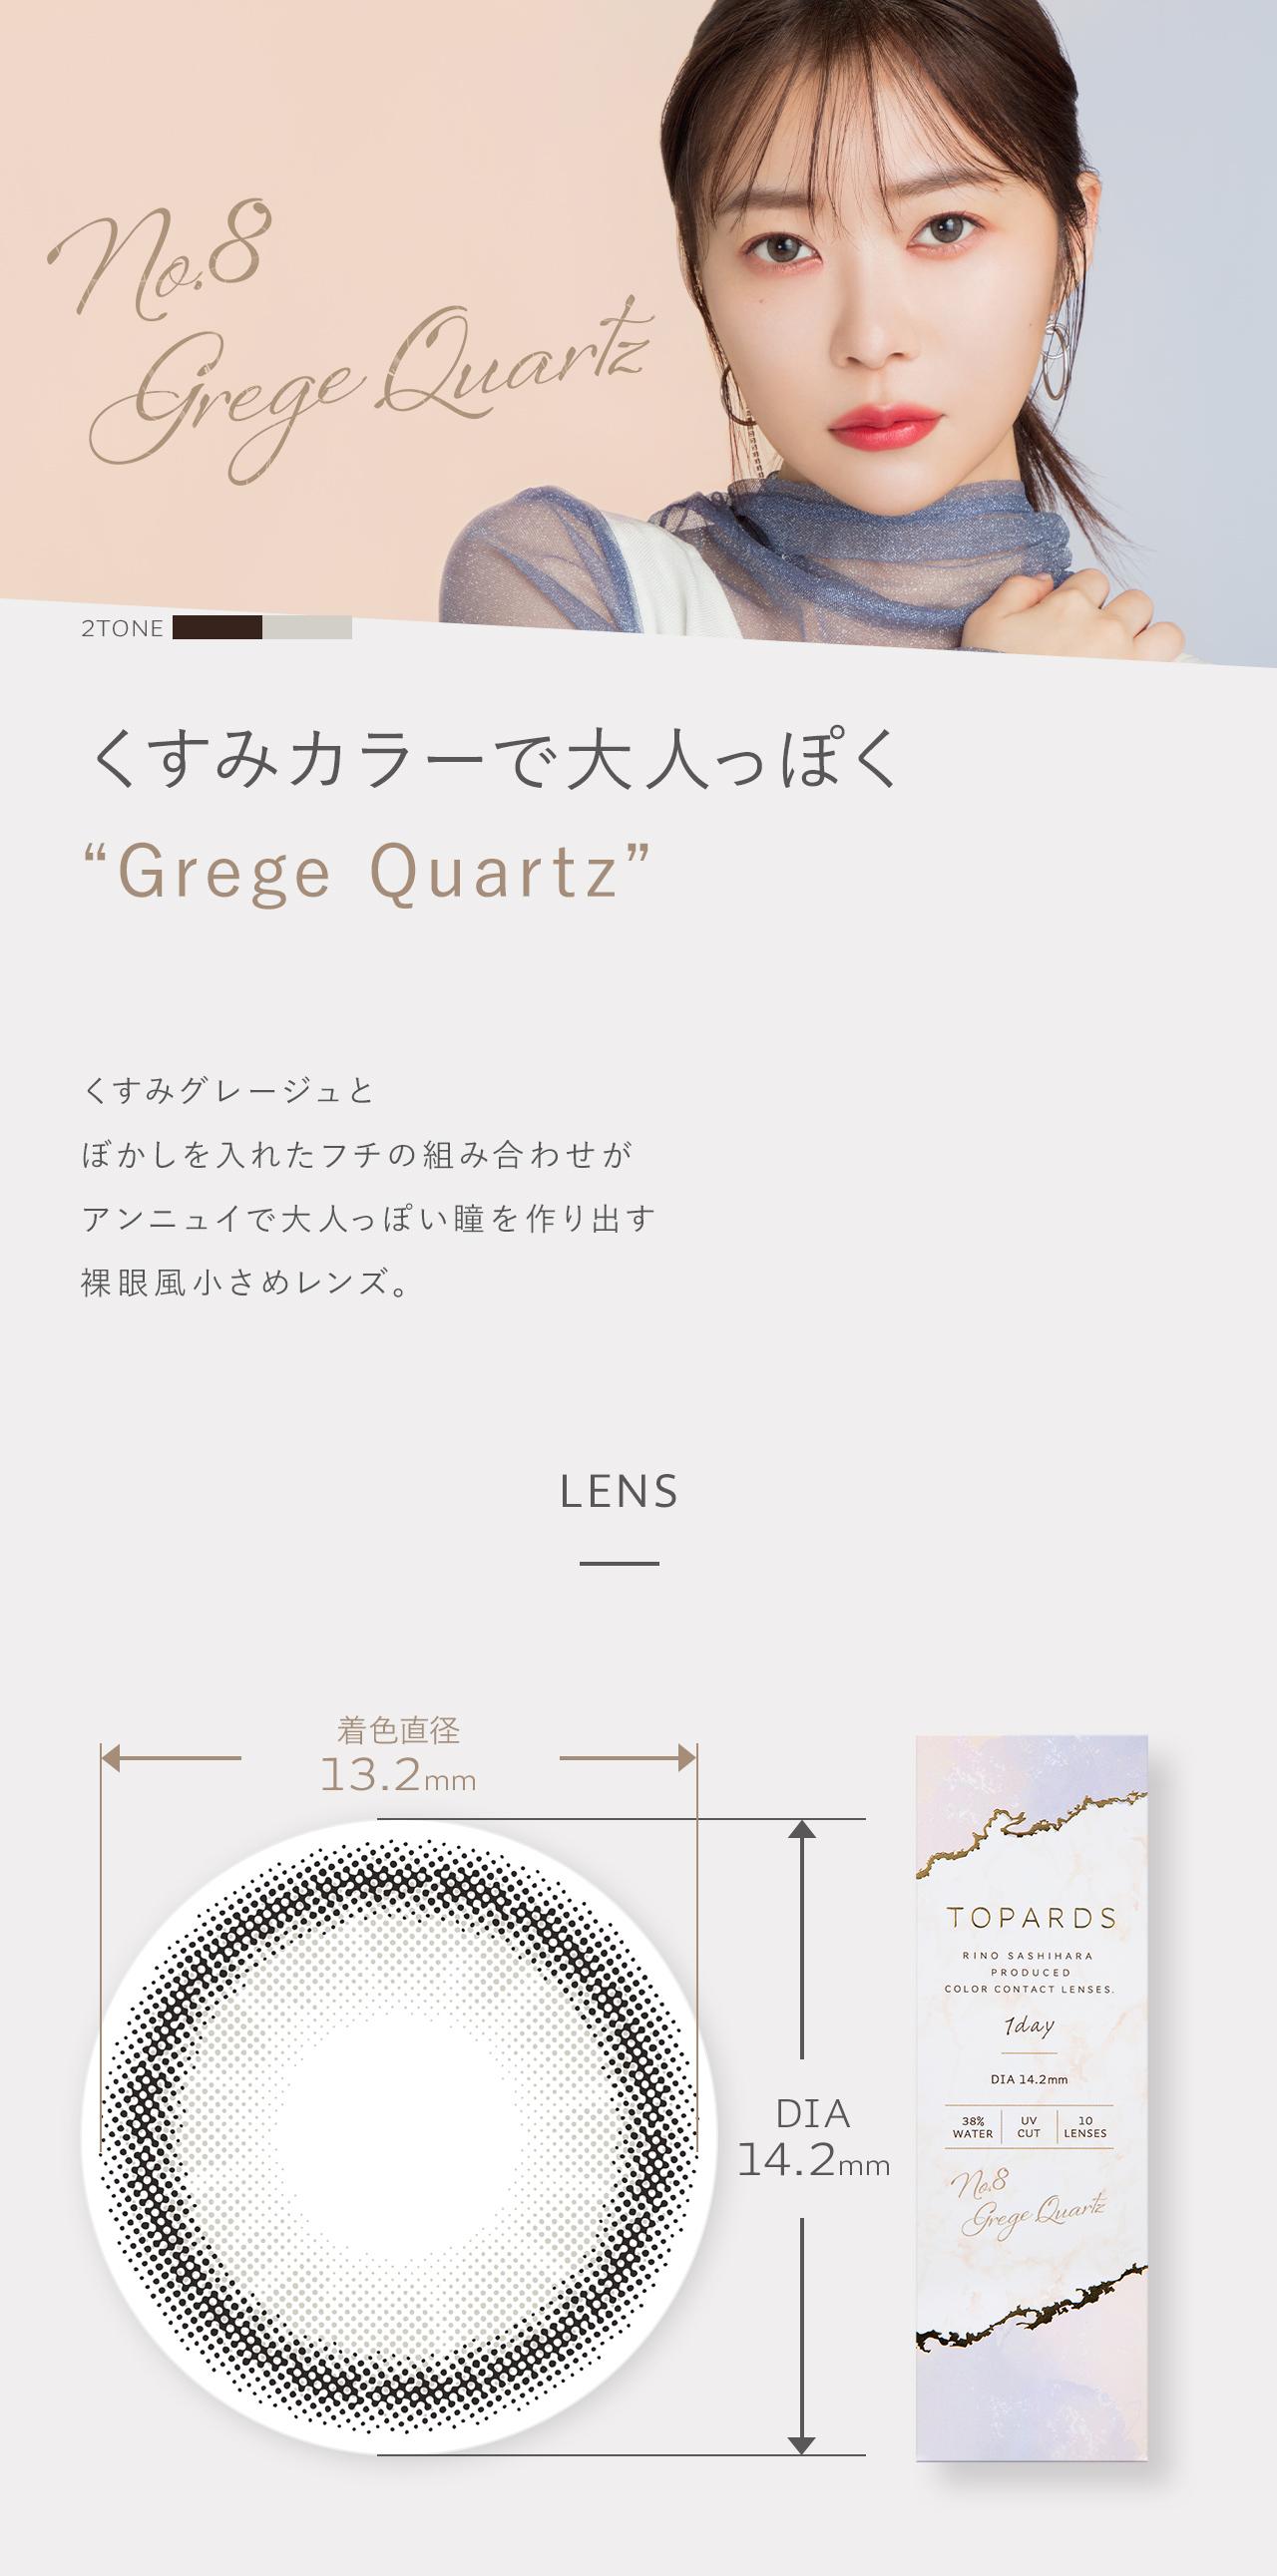 Grege Quarts グレージュクォーツ